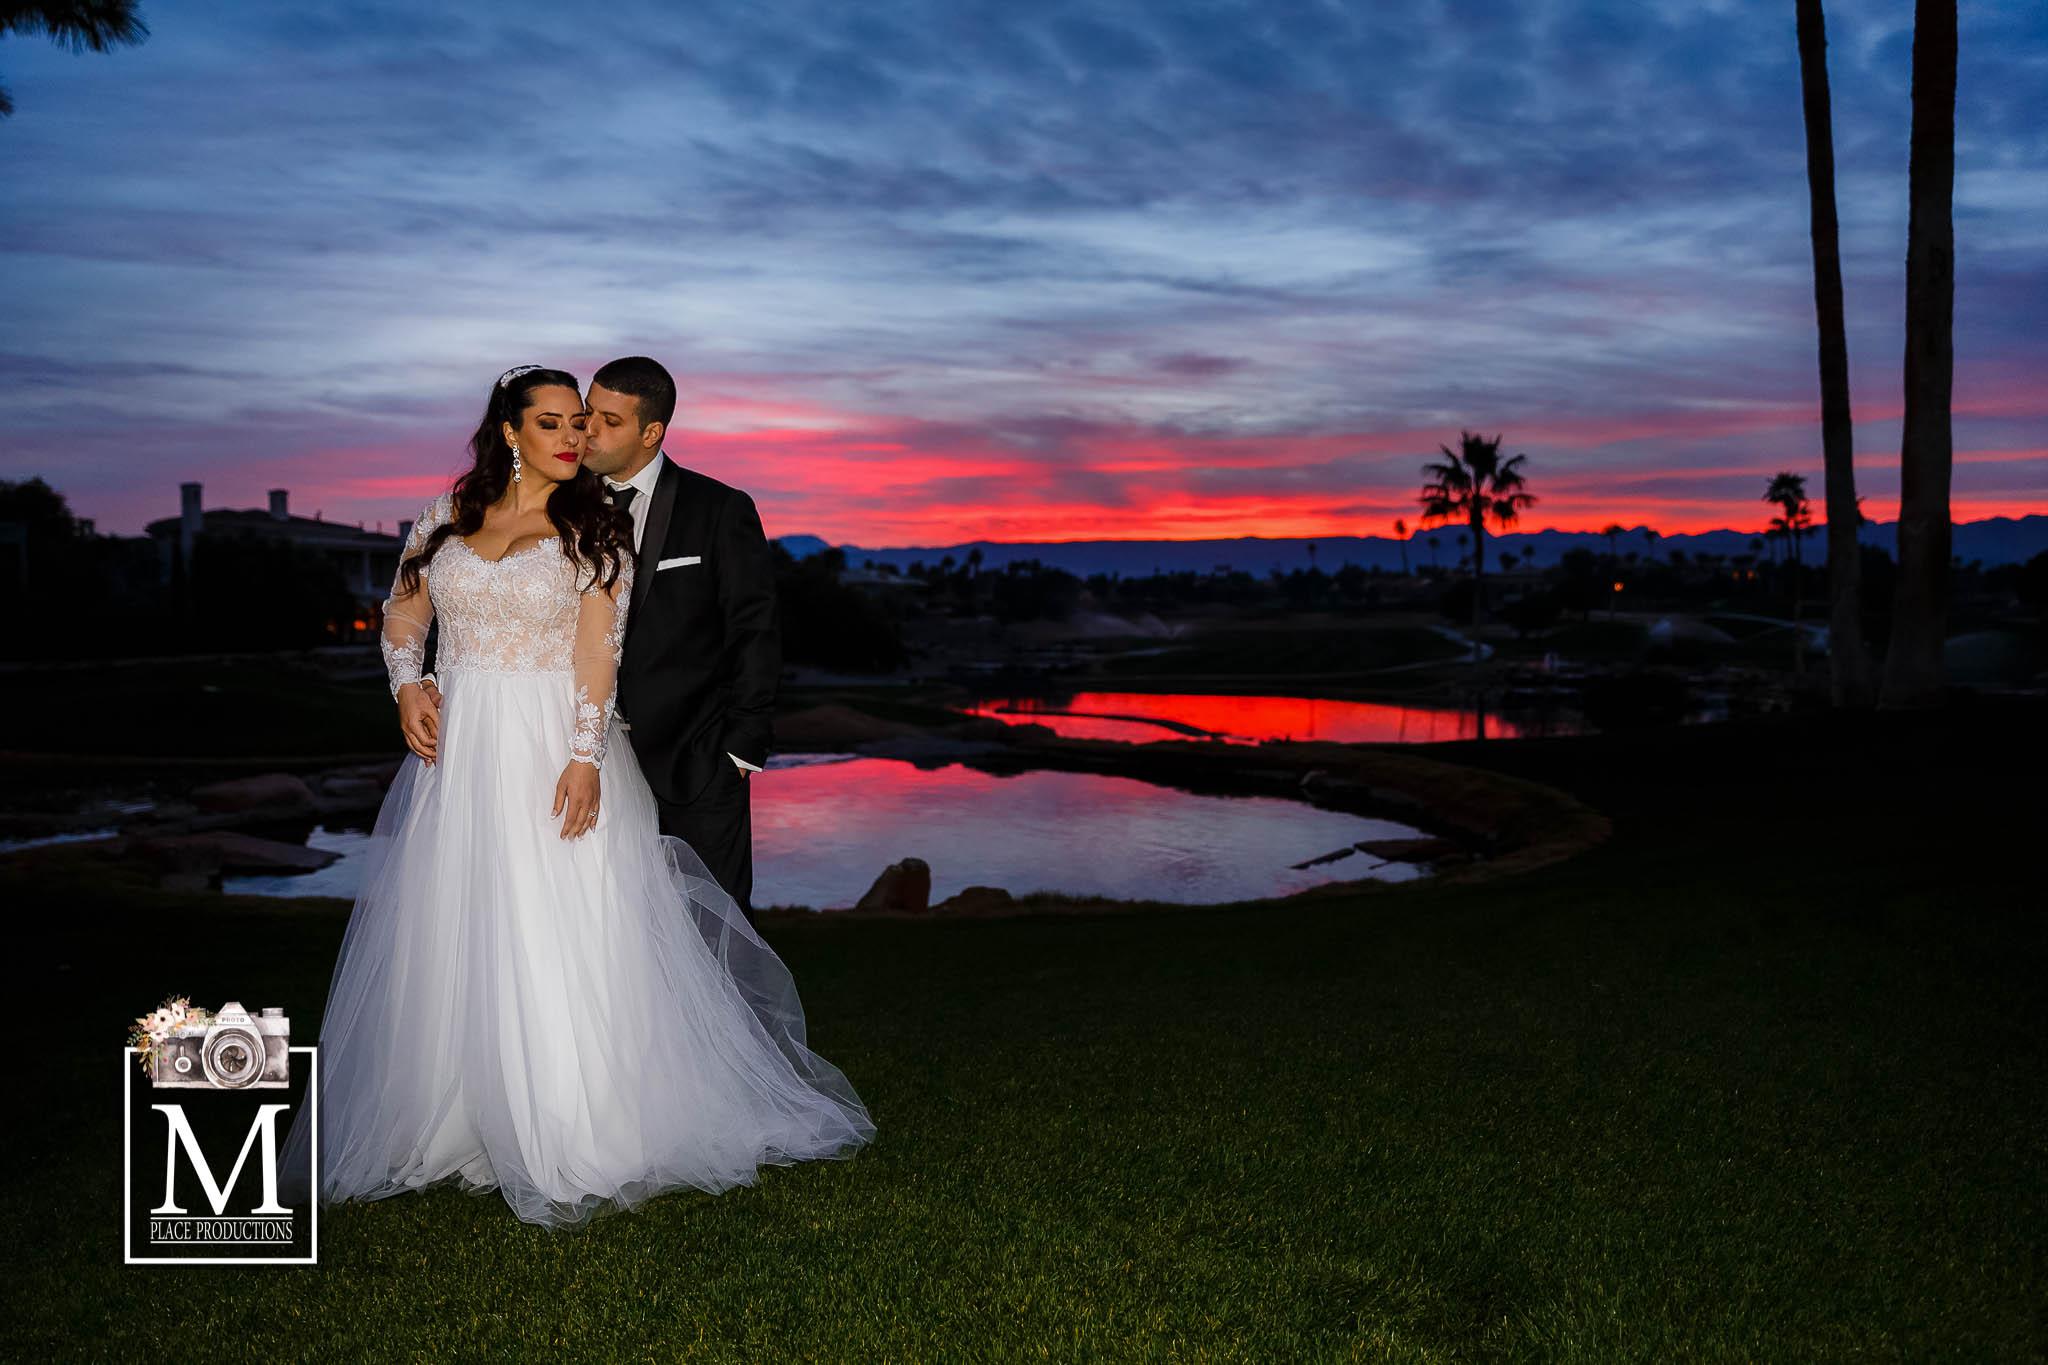 Sydney Wedding Videographers